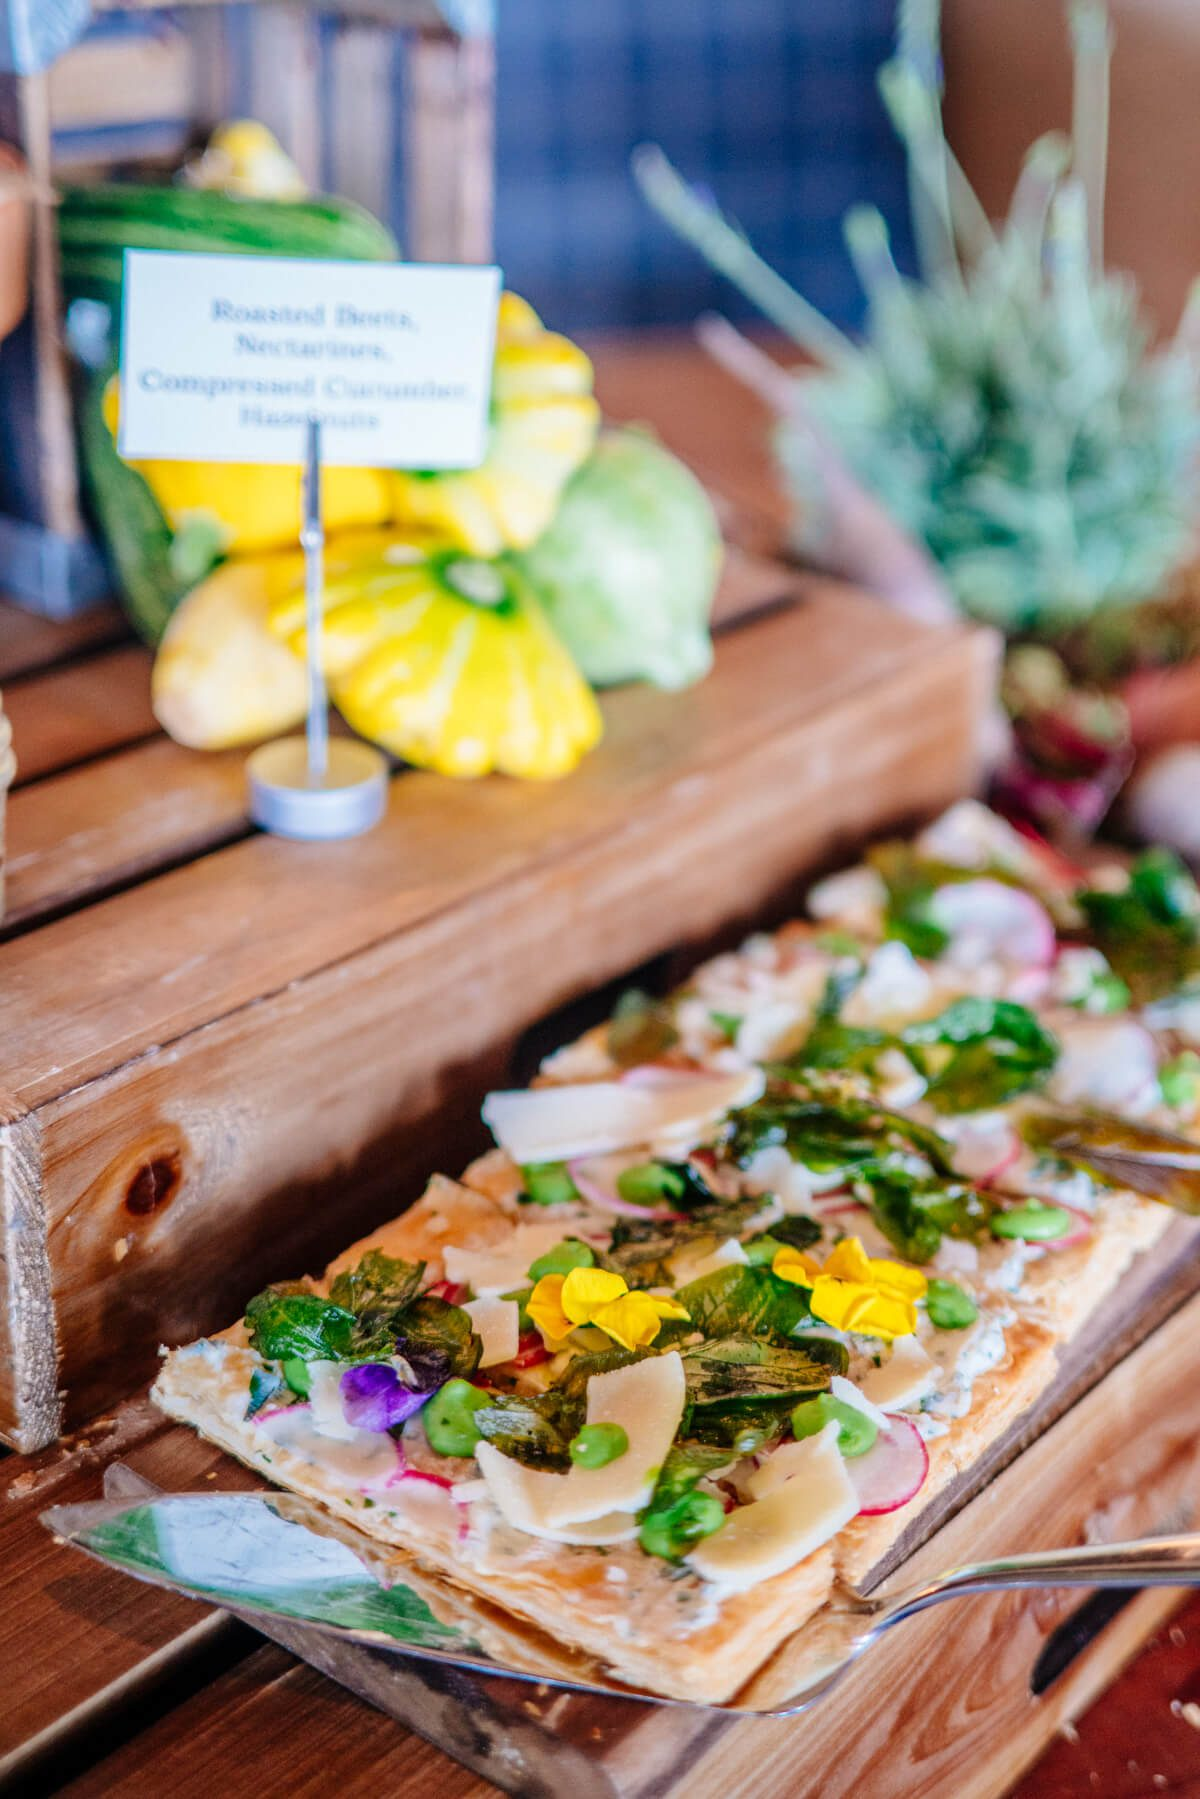 Herb Ricotta Fava Bean and Spring Radish Tart served at The Ritz -Calton half-moon bay